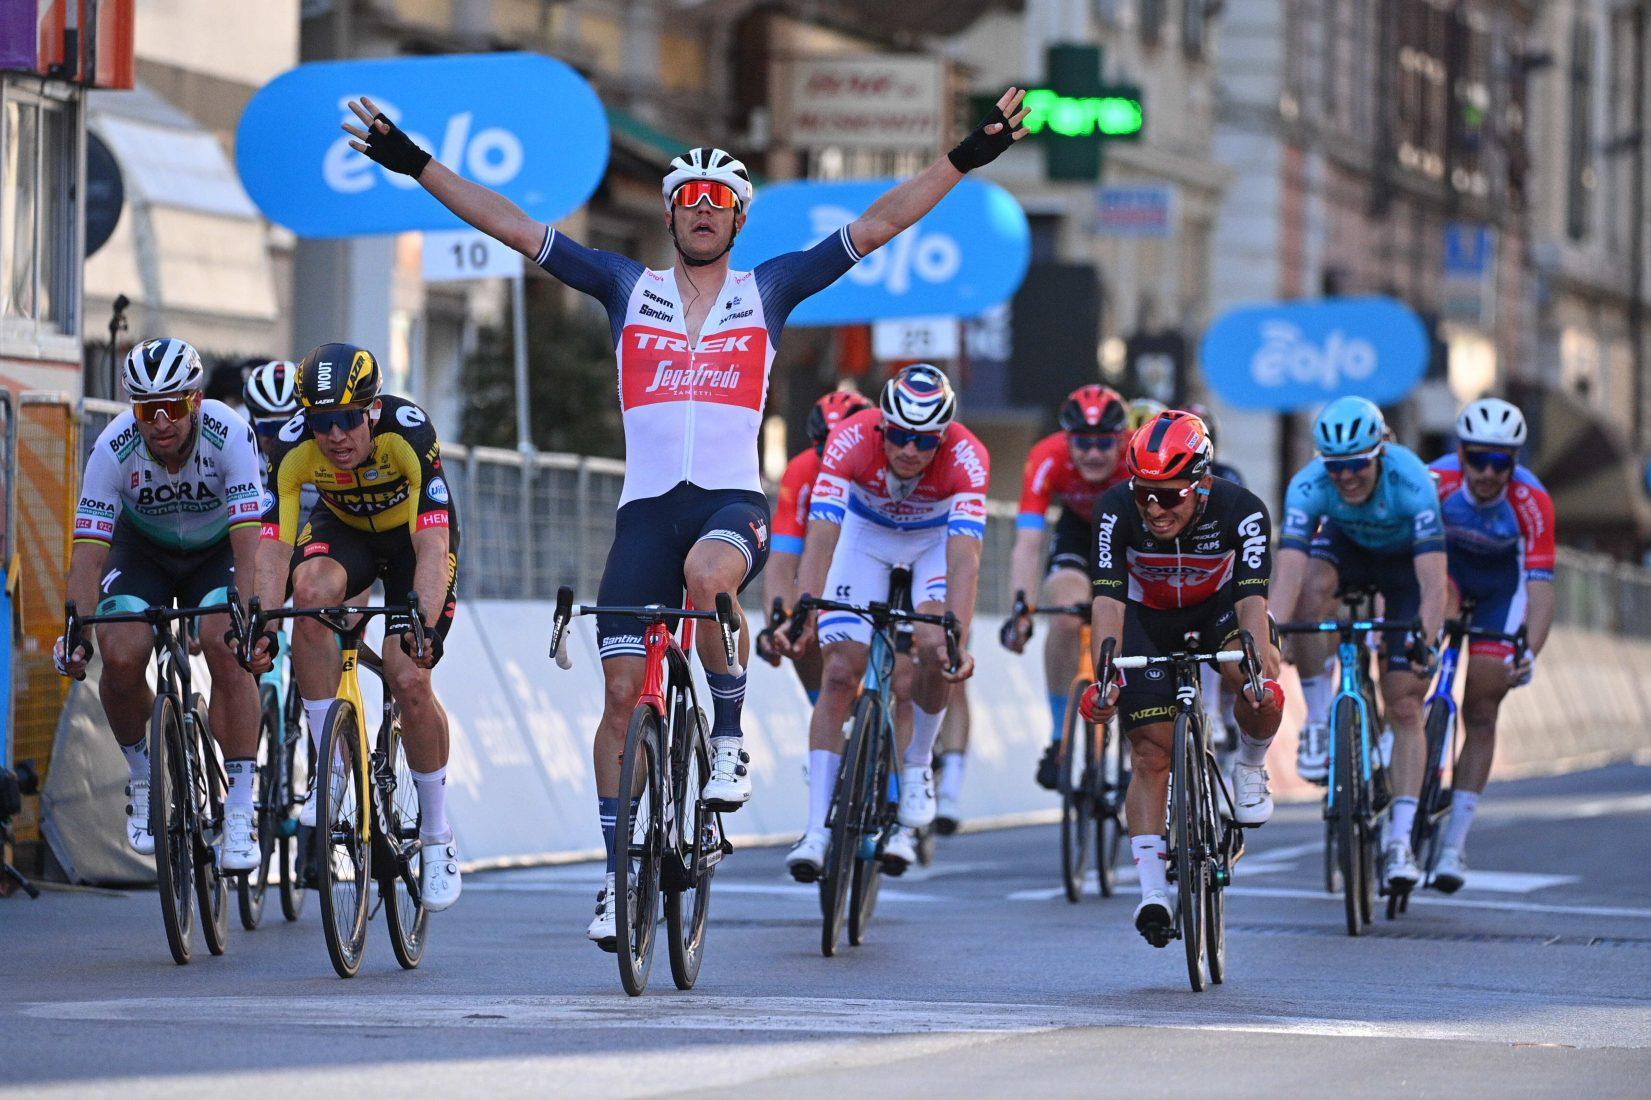 Jasper Stuyvenha vinto la 112a Milano-Sanremo